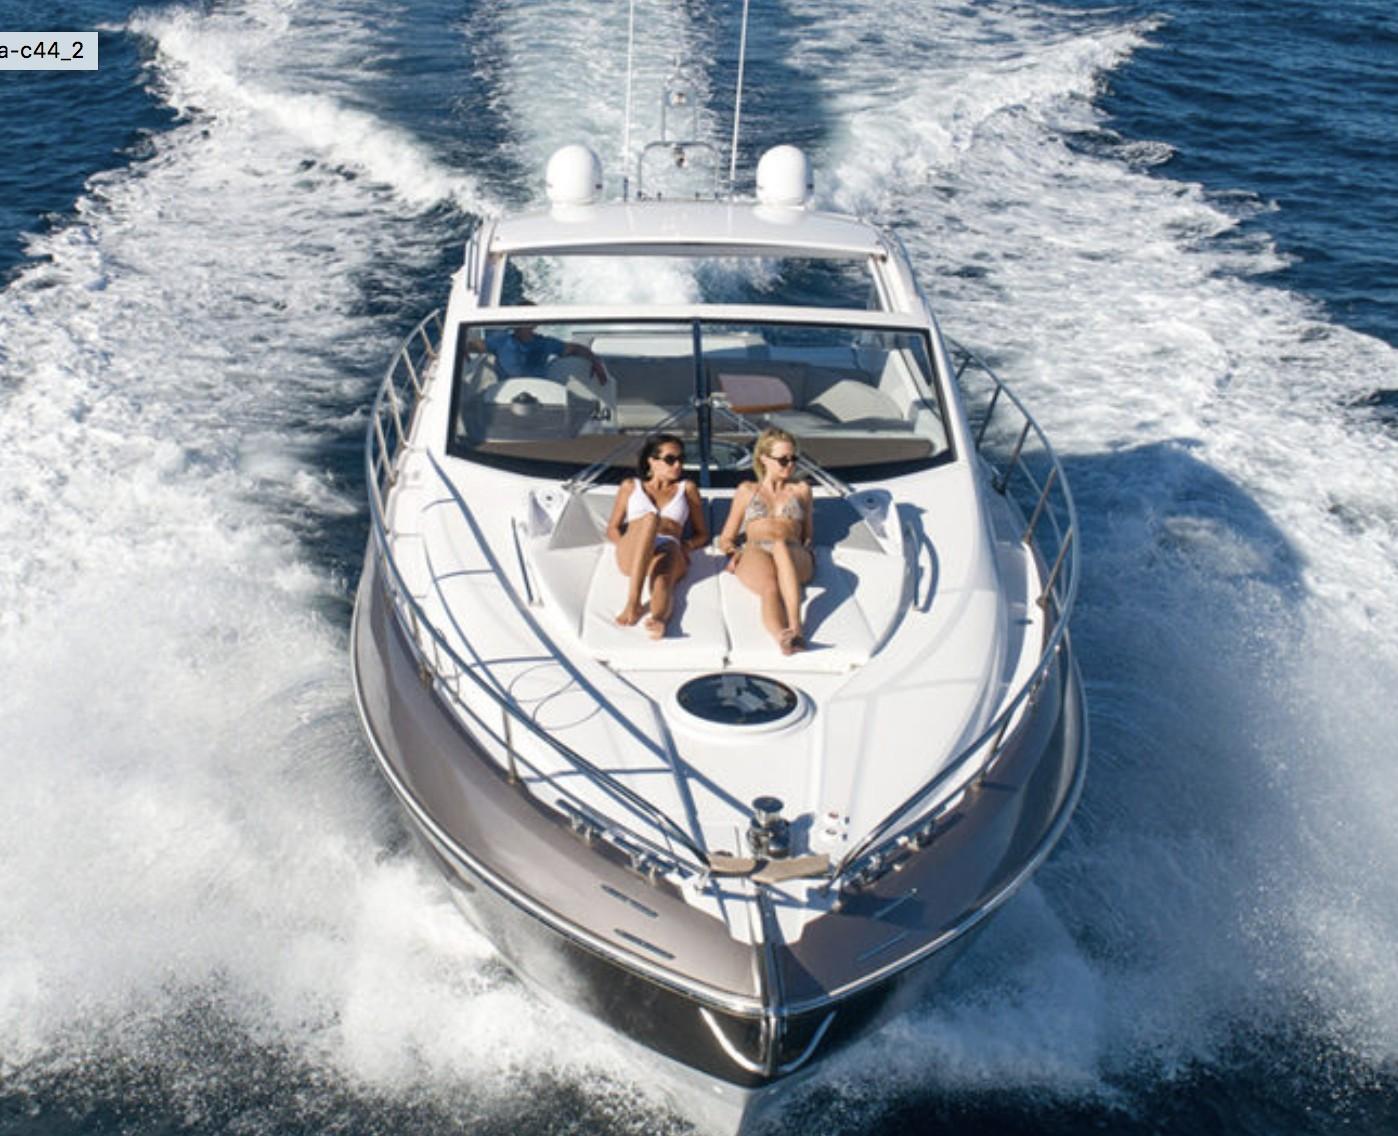 Yacht Sessa C44 Luxury Boat